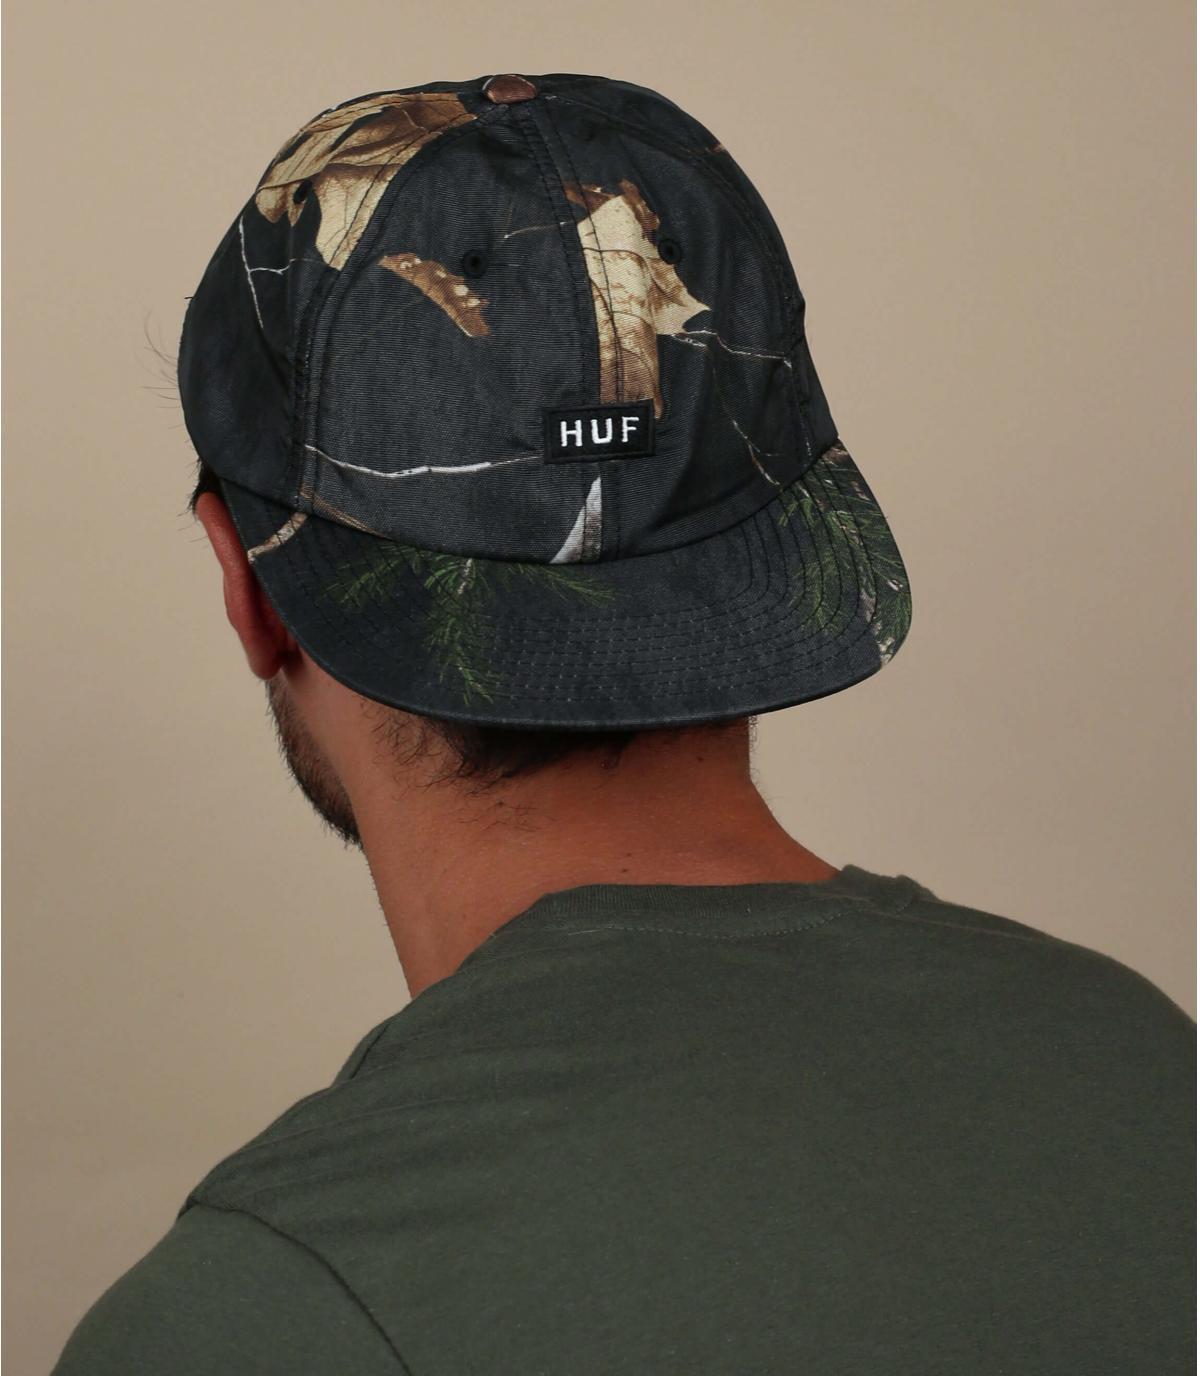 Huf Realtree cap